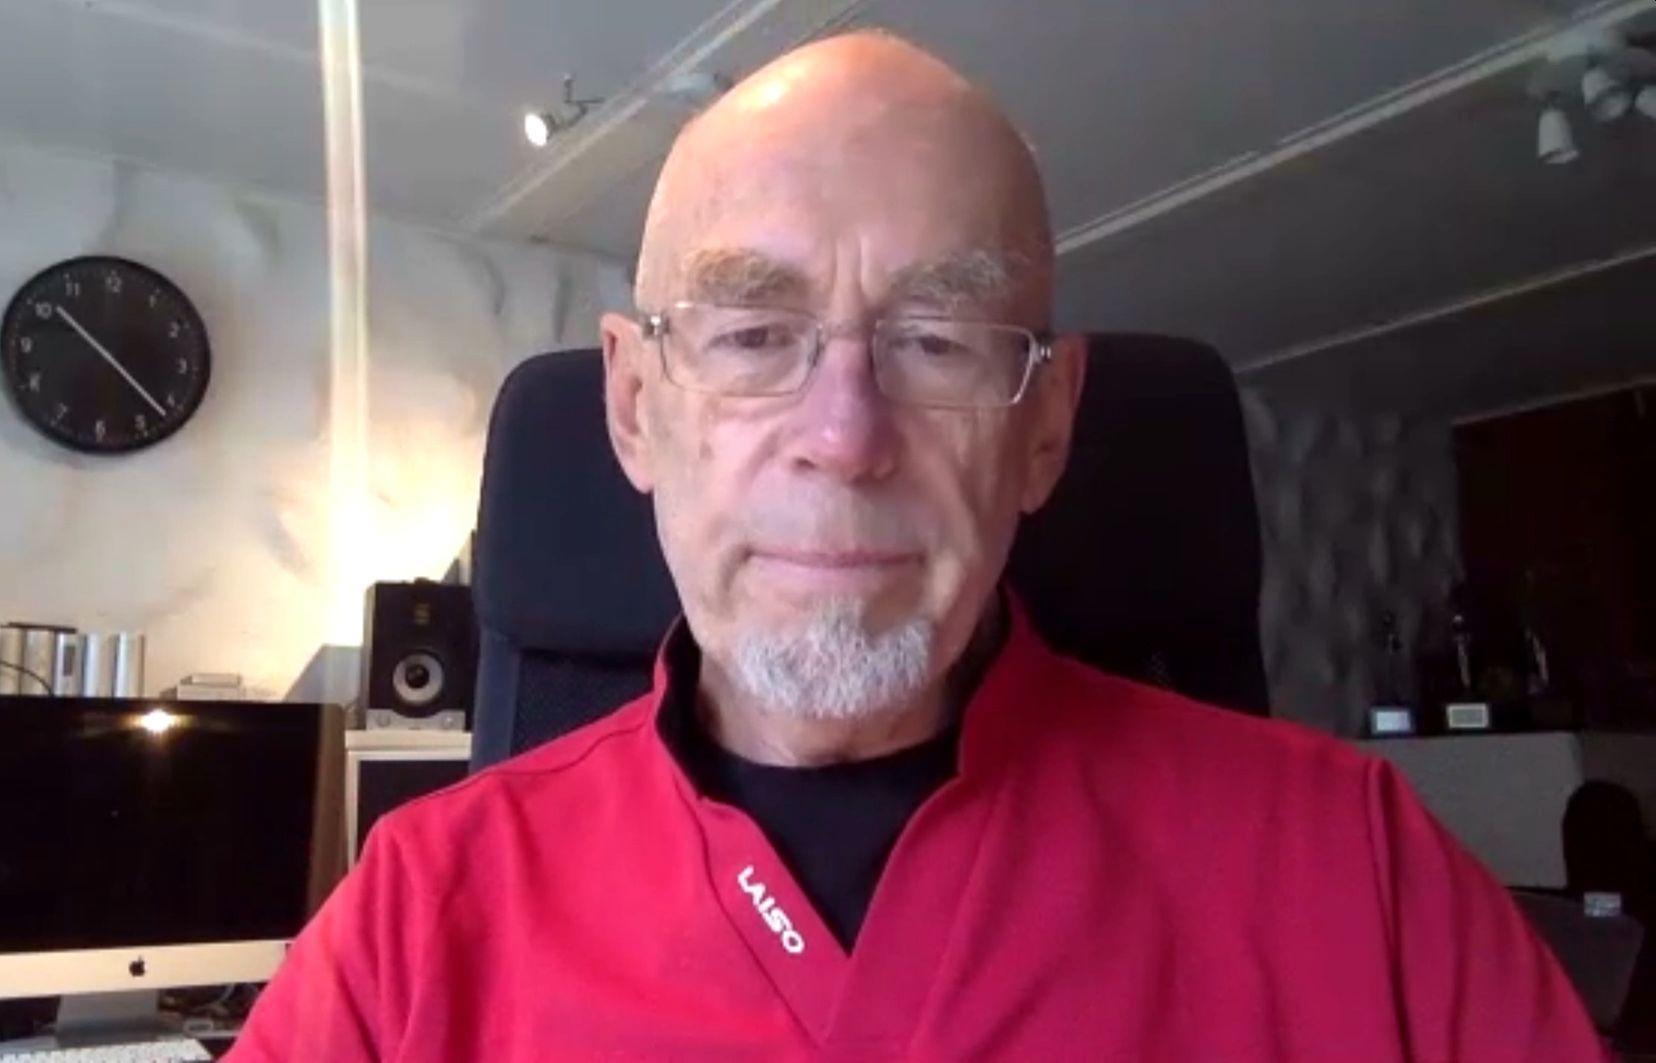 Gerhard Praher im Gespräch mit Terje Toftenes, norwegischer Filmproduzent / New Paradigm Films